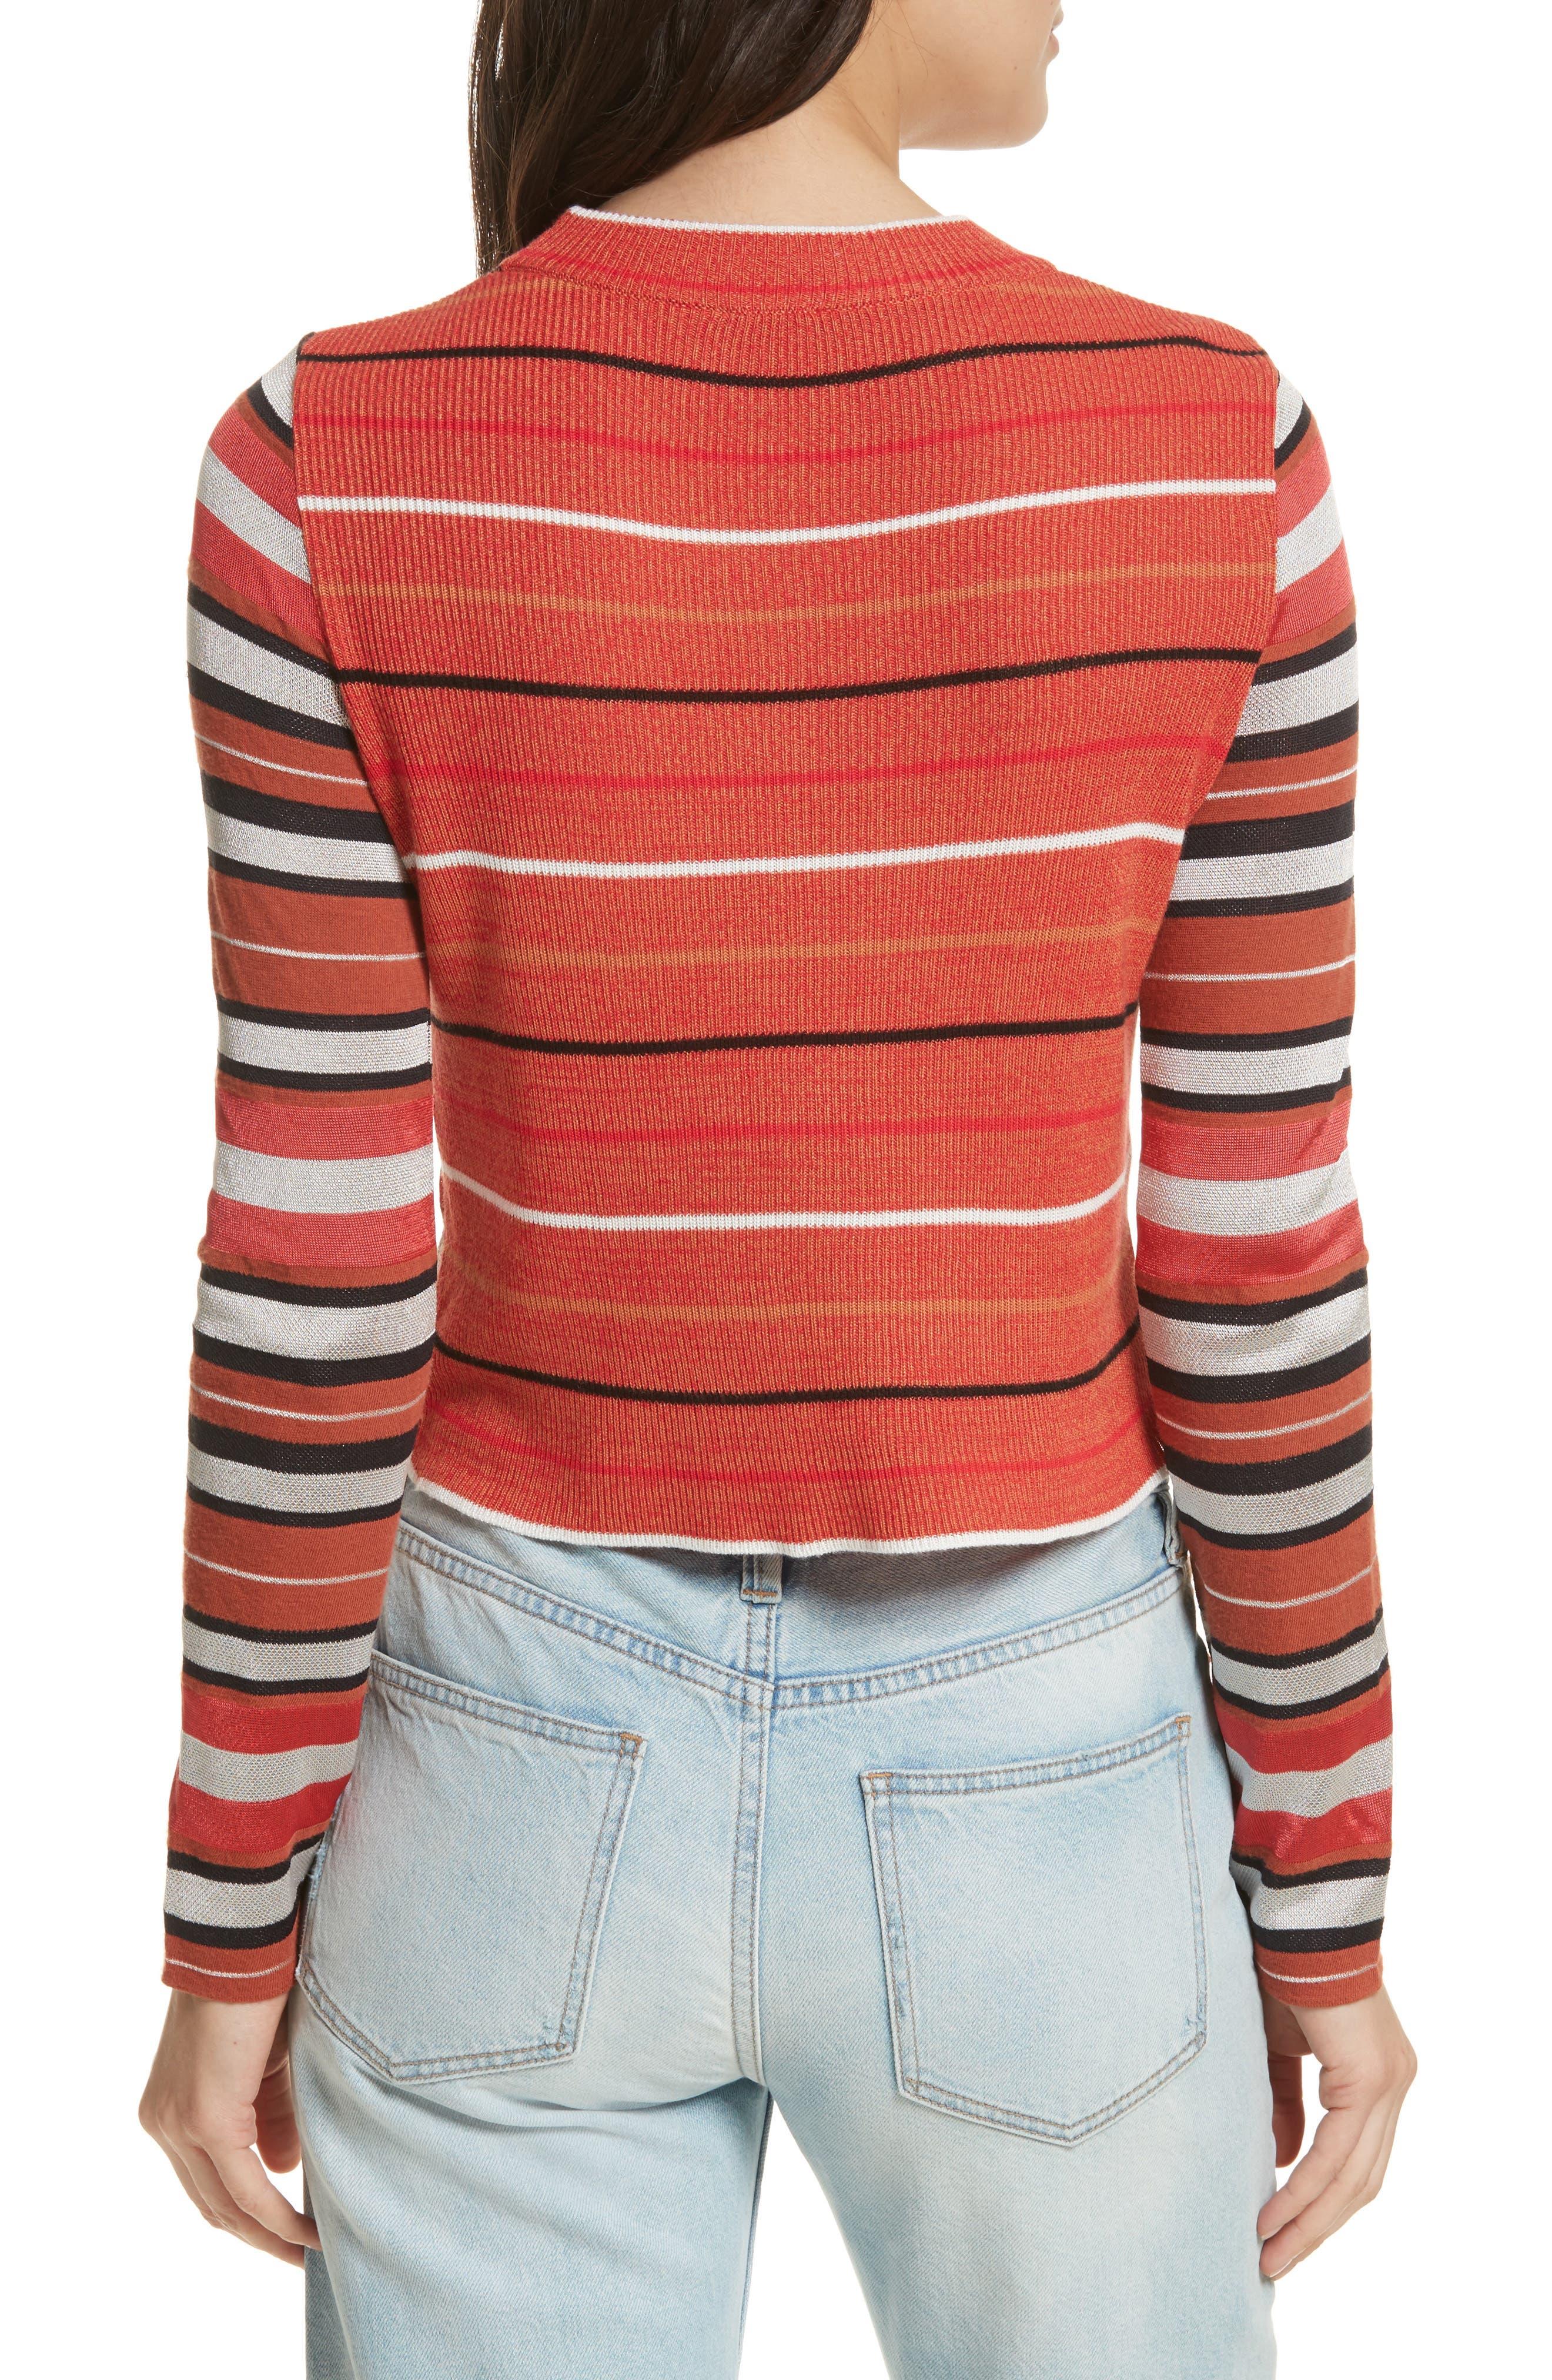 New Age Crewneck Sweater,                             Alternate thumbnail 4, color,